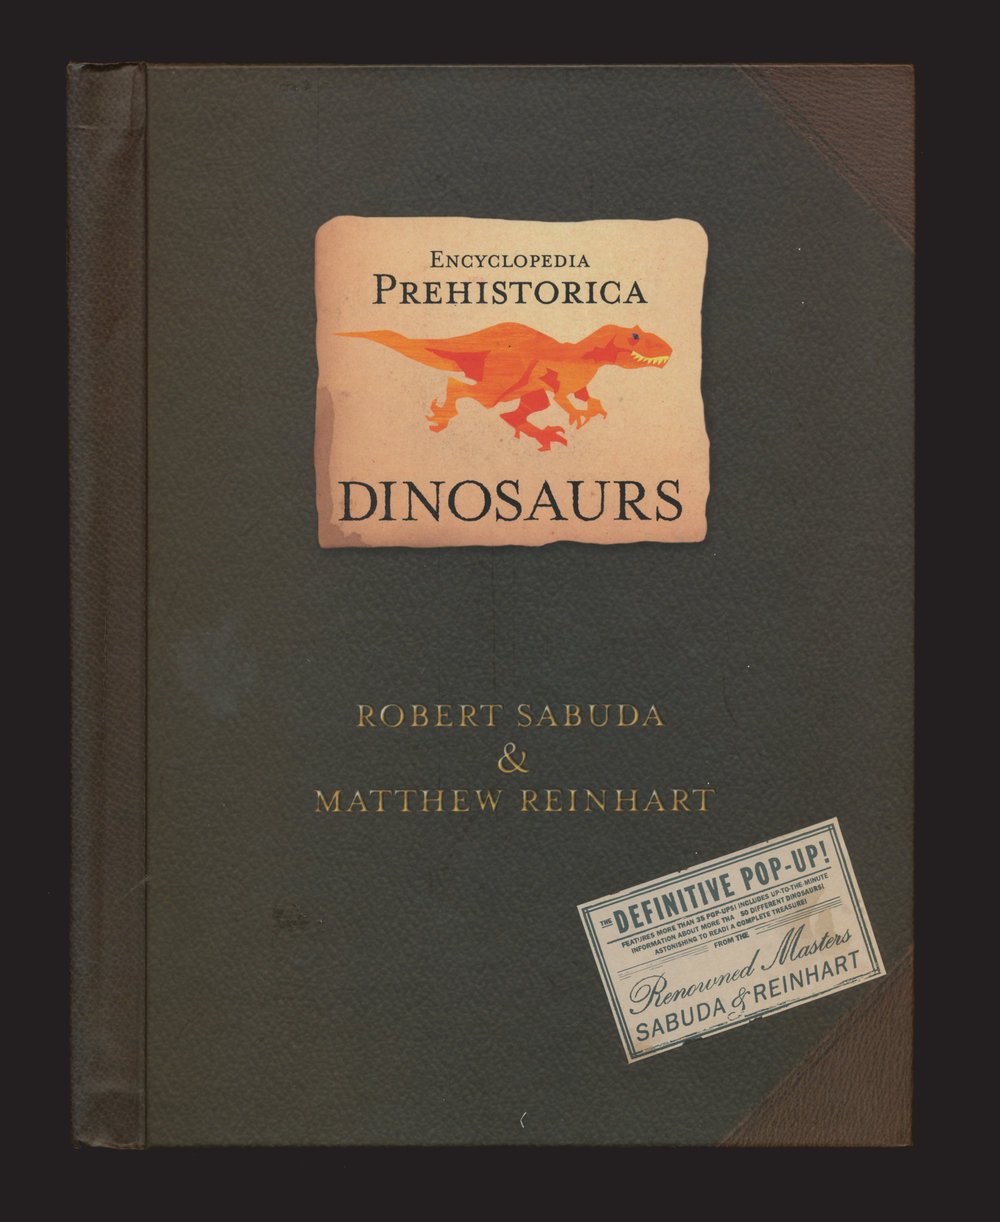 EP1_Dinosaurs cover.jpg